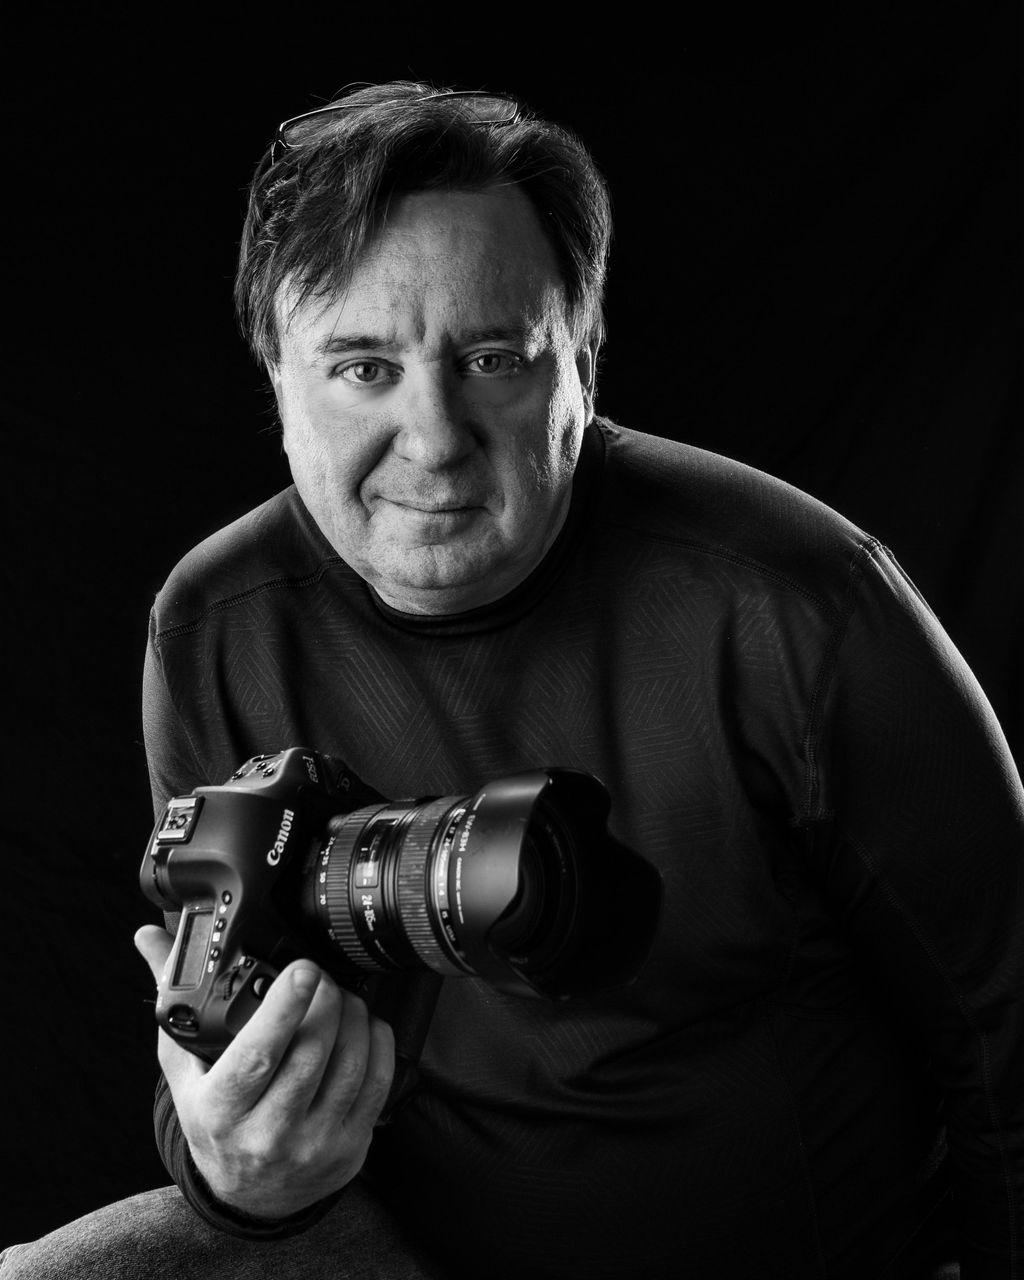 Pendleton Photography